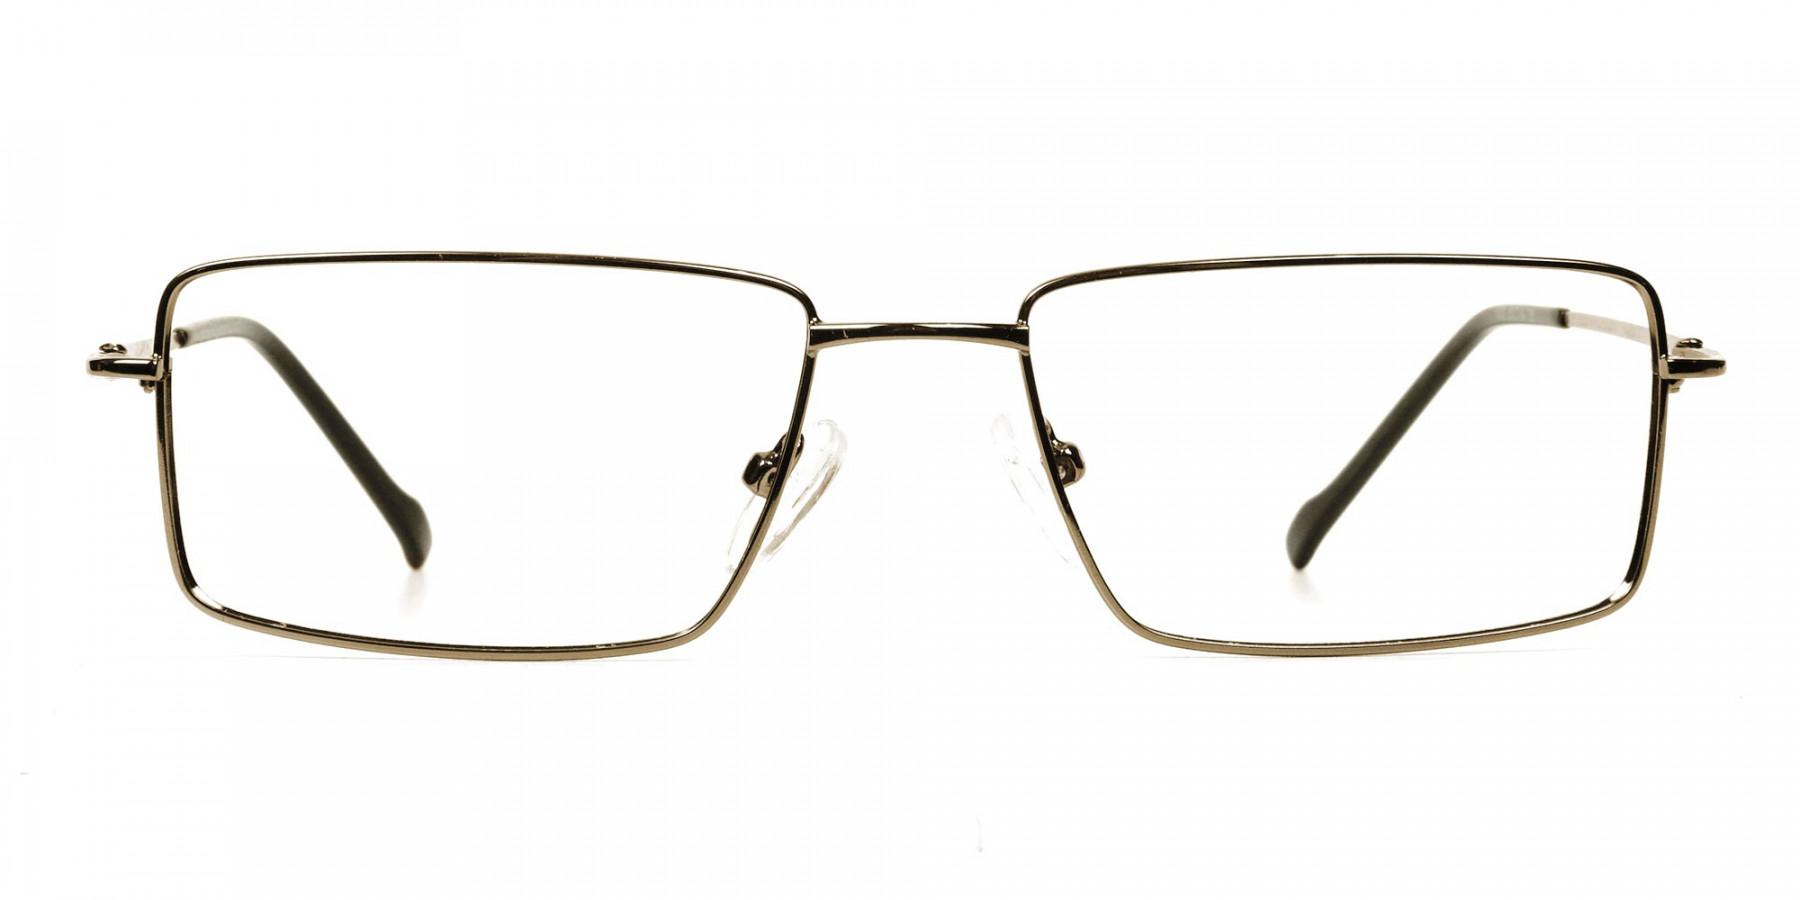 Rectangular Glasses in Gunmetal - 1